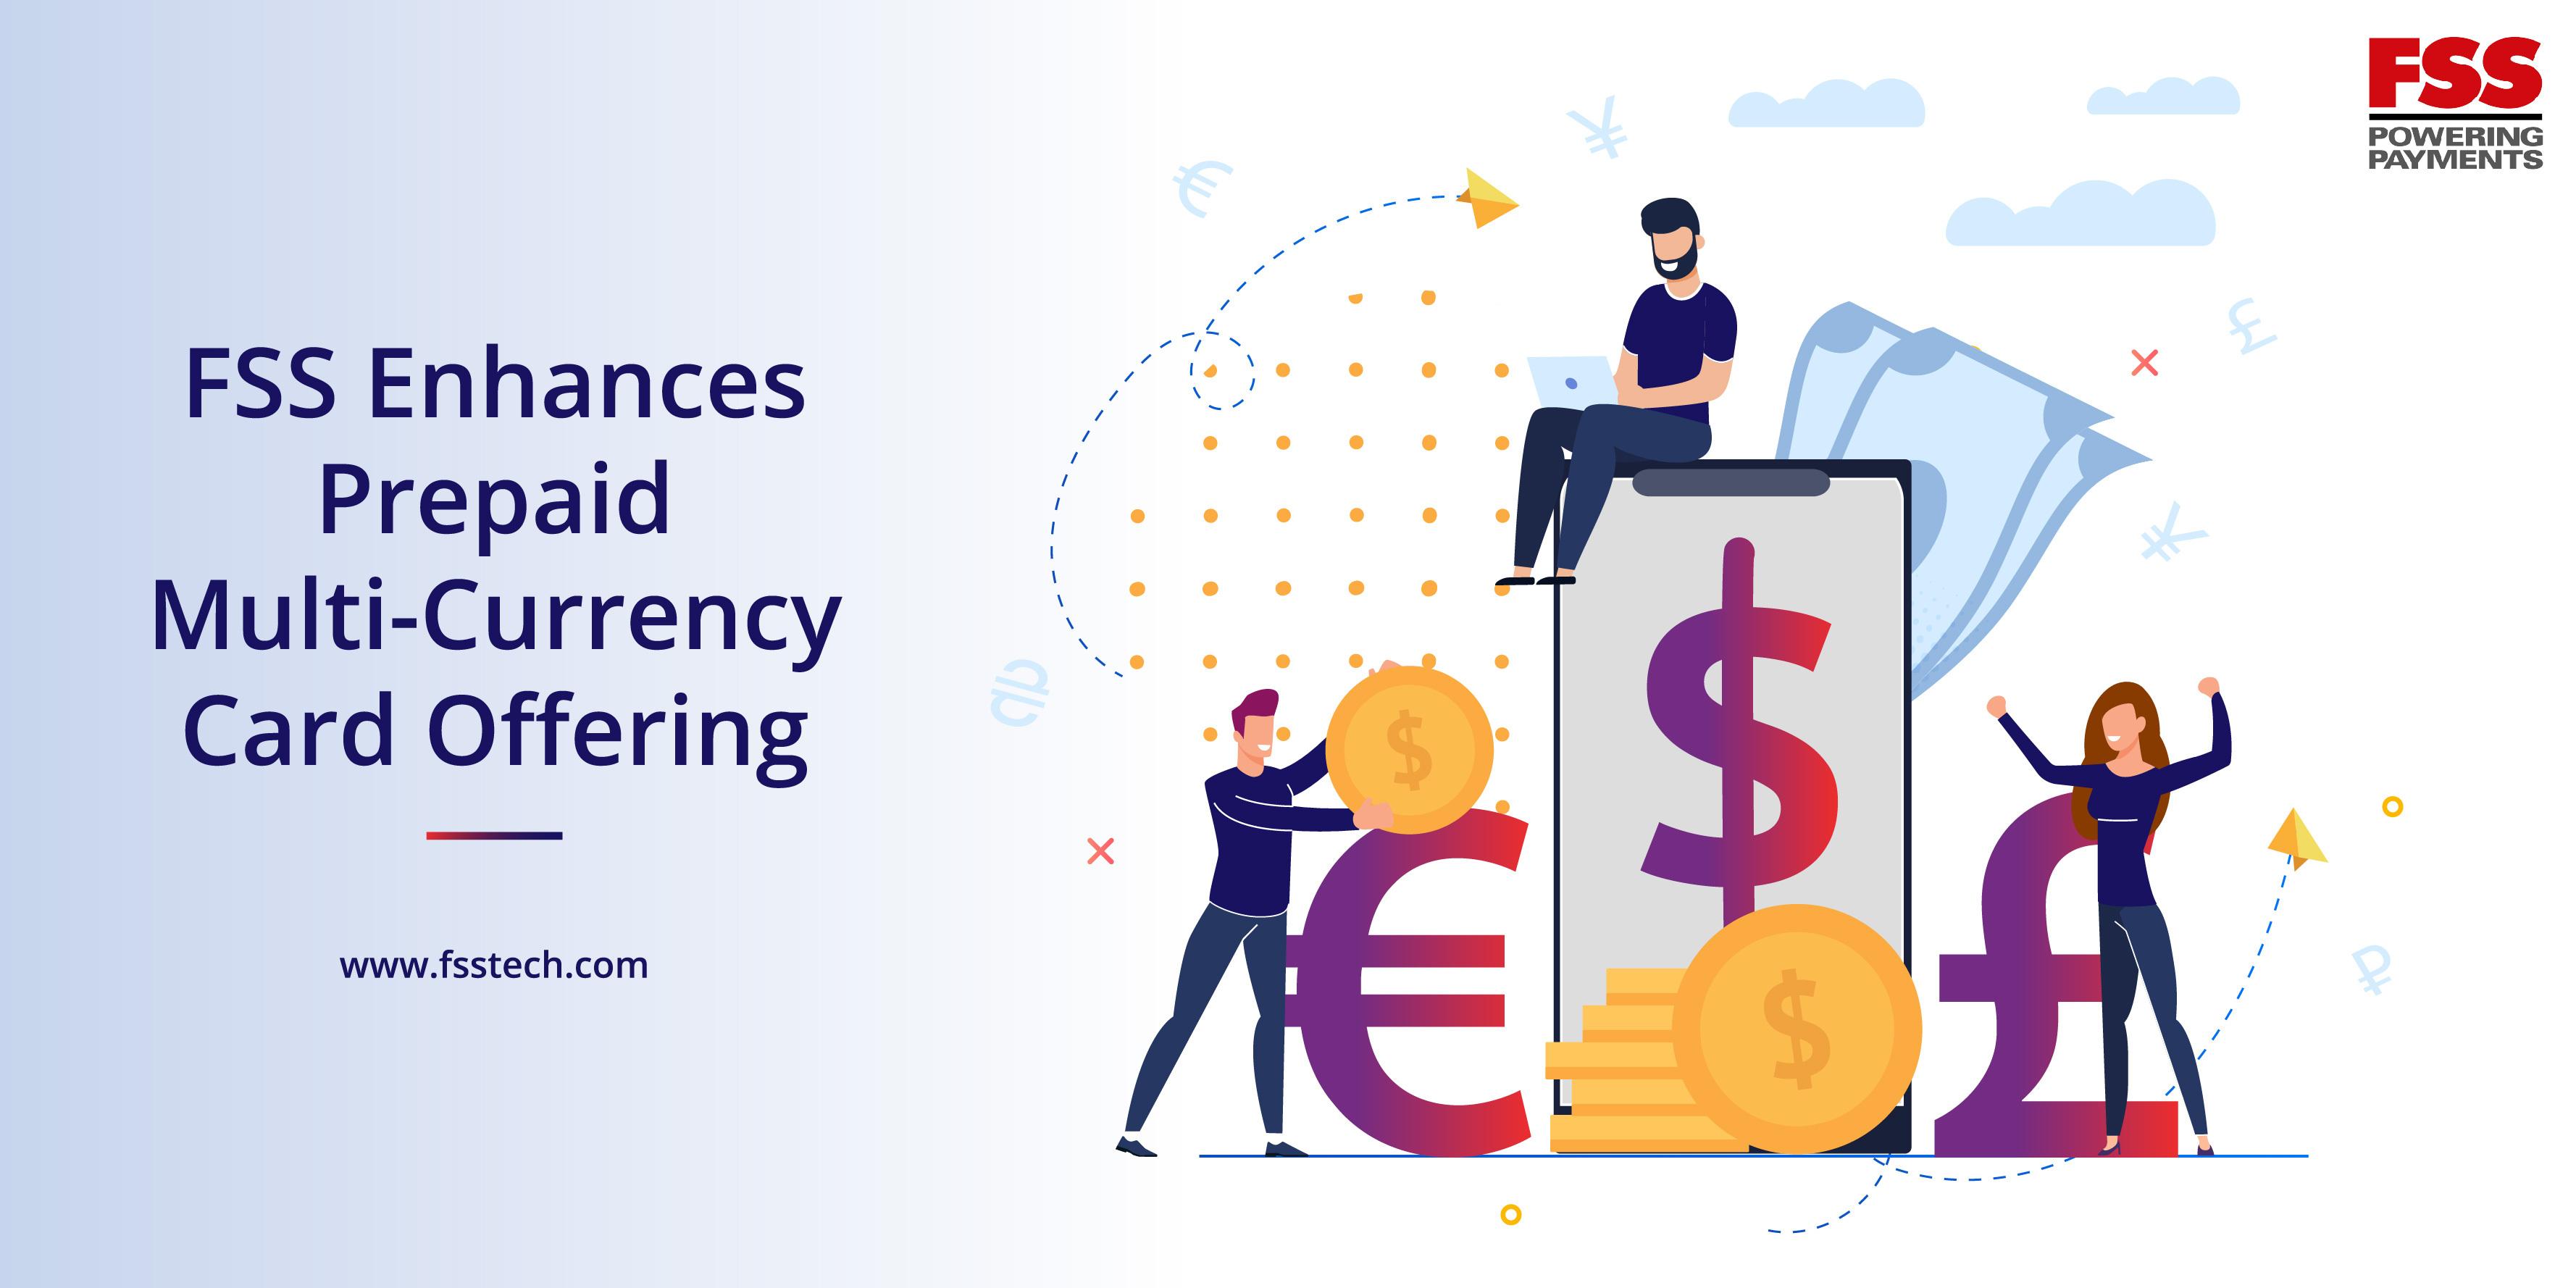 FSS Enhances Prepaid Multi-Currency Card Offering